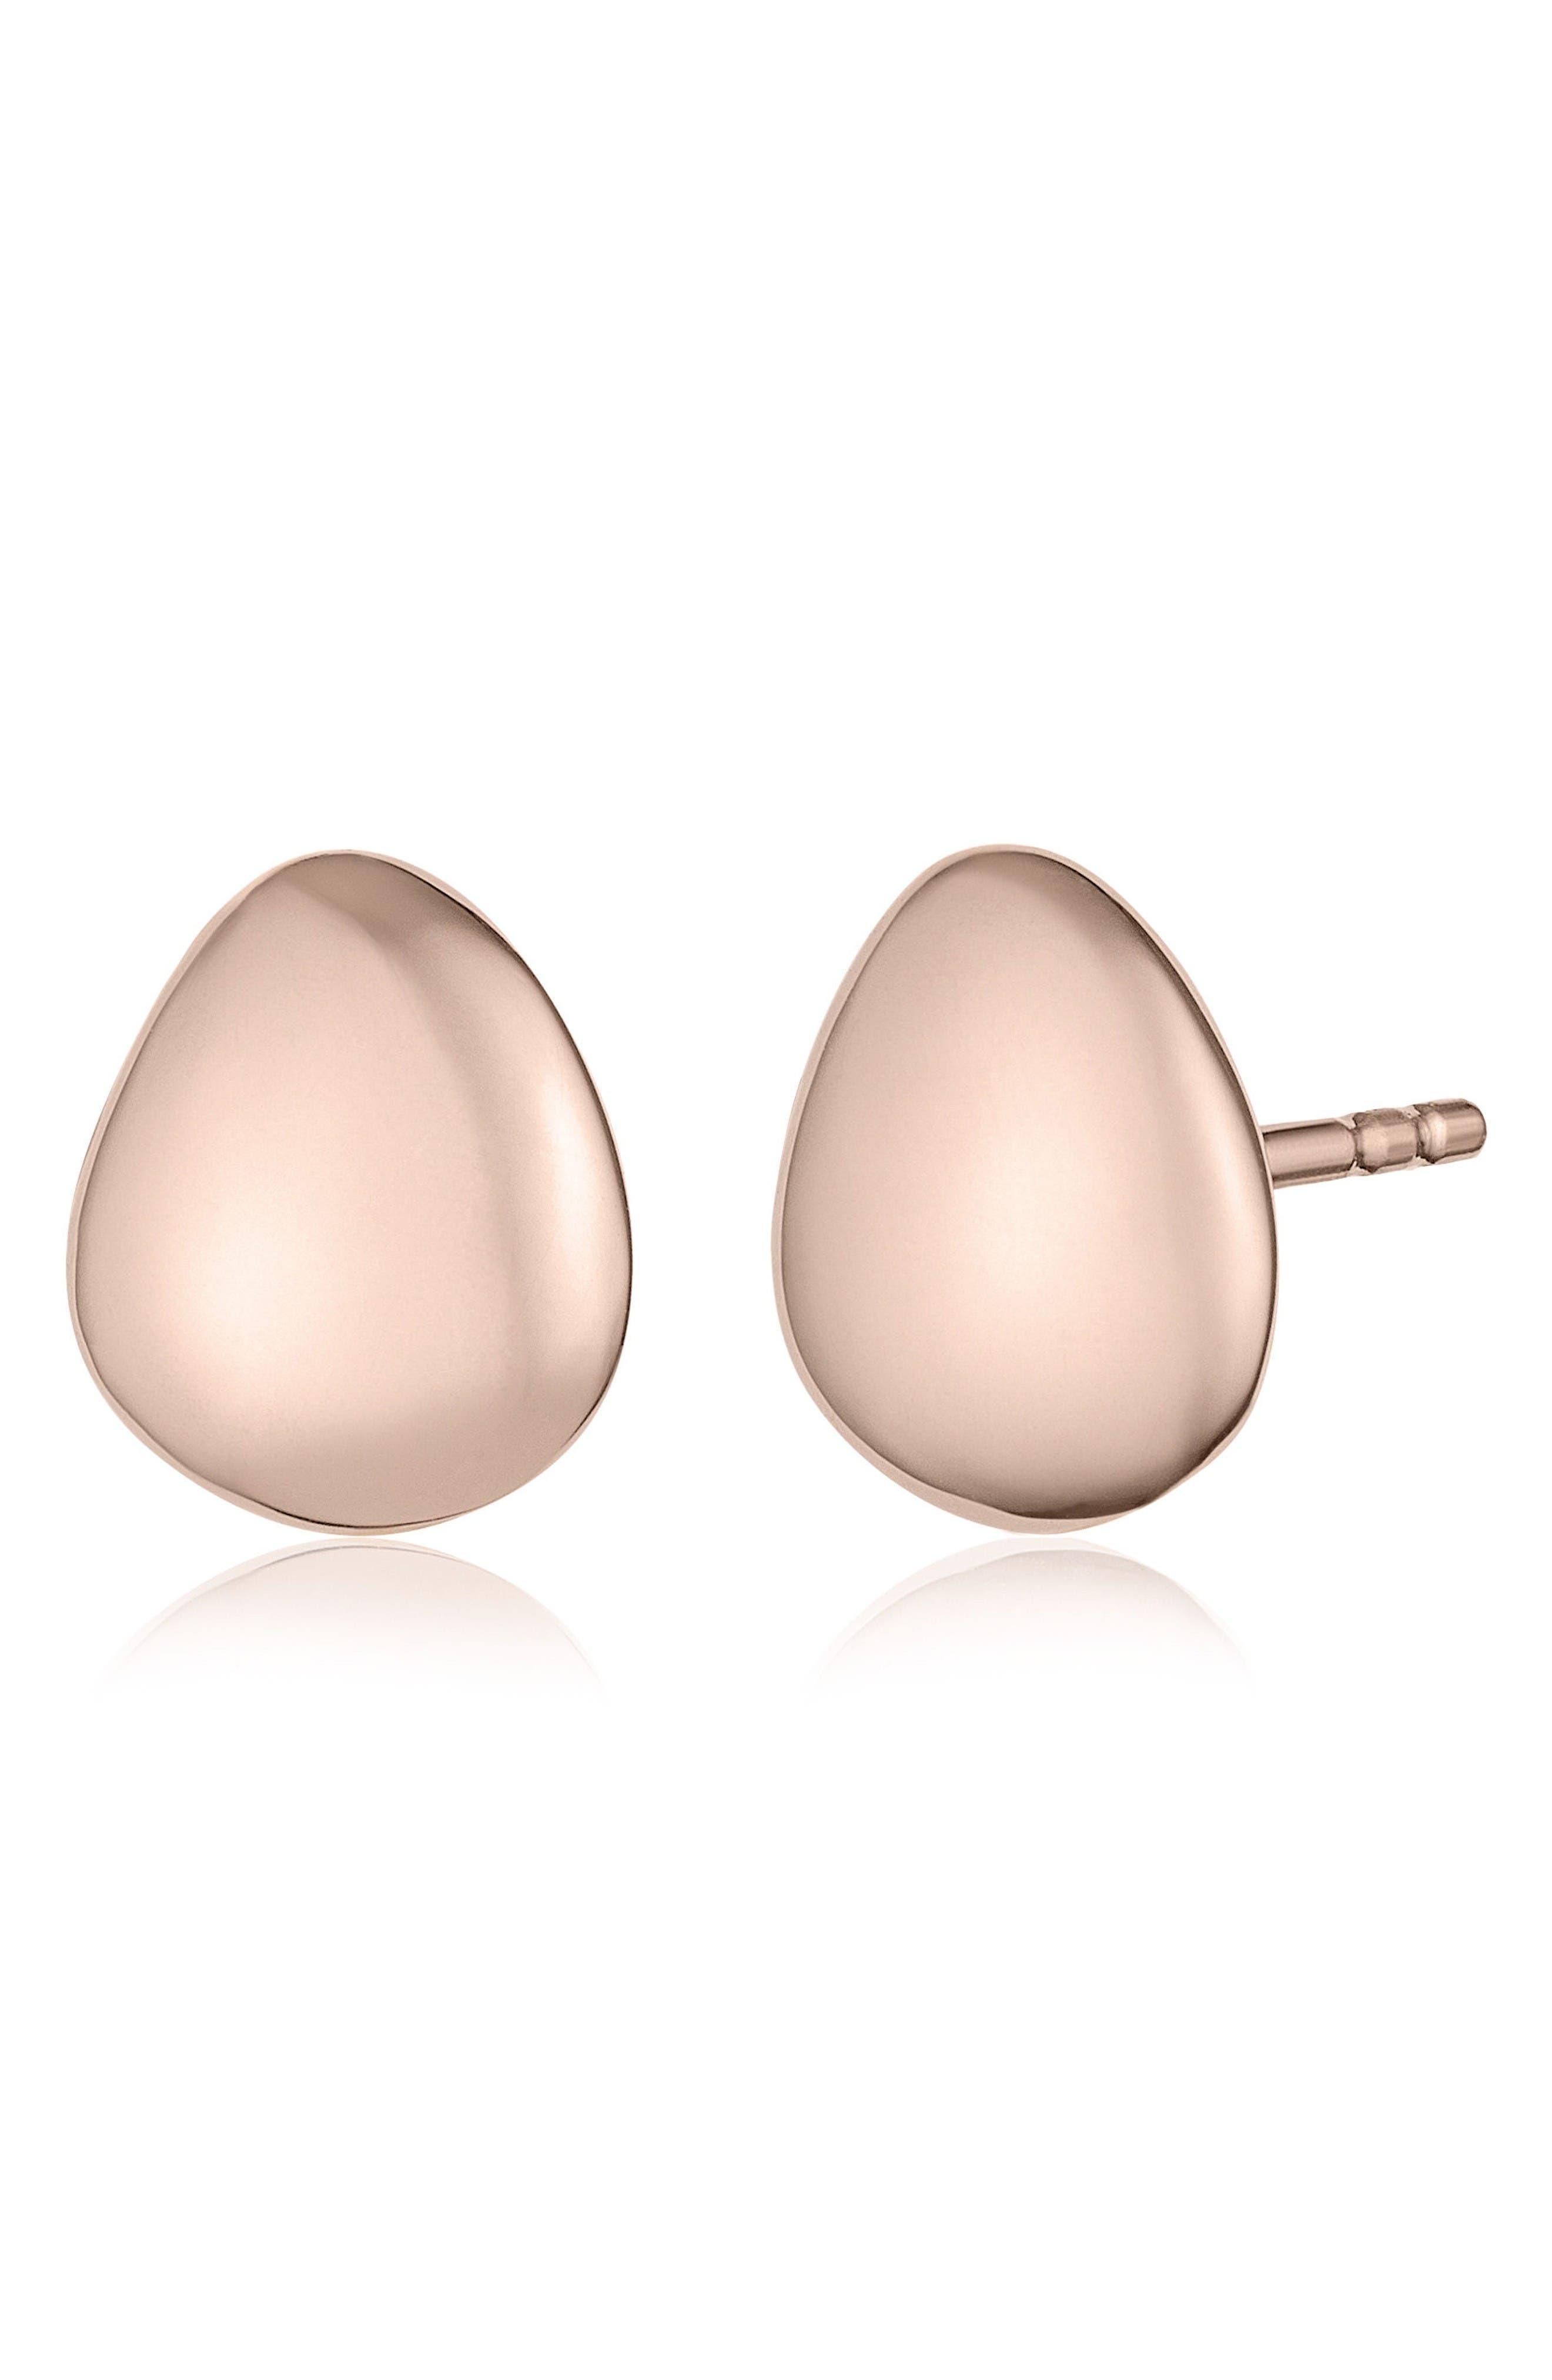 Monica Vinader Nura Small Pebble Stud Earrings